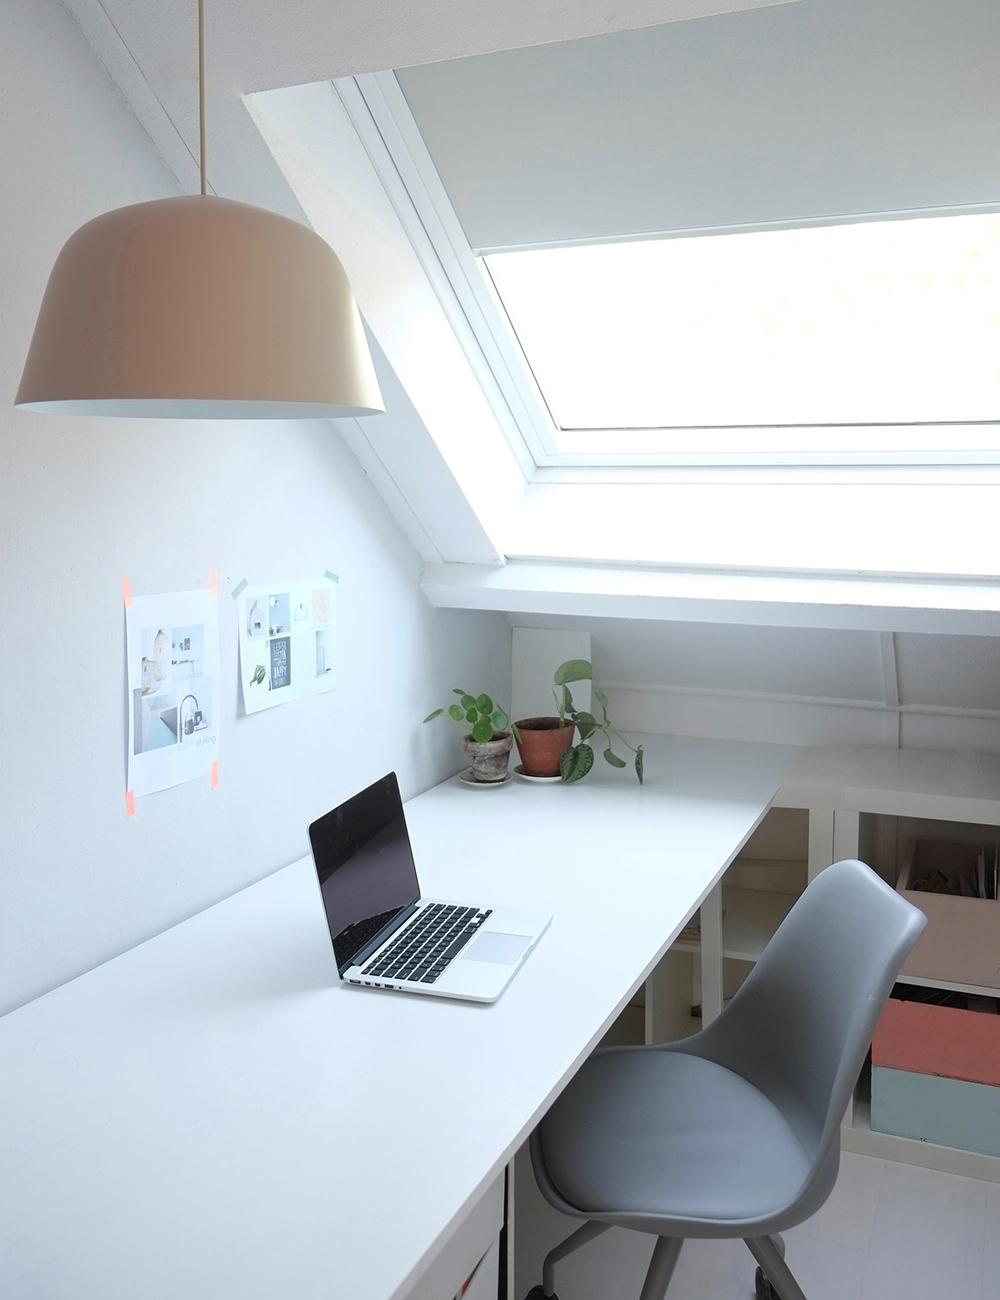 raambekleding--interieurstylist-Utrecht-Houten